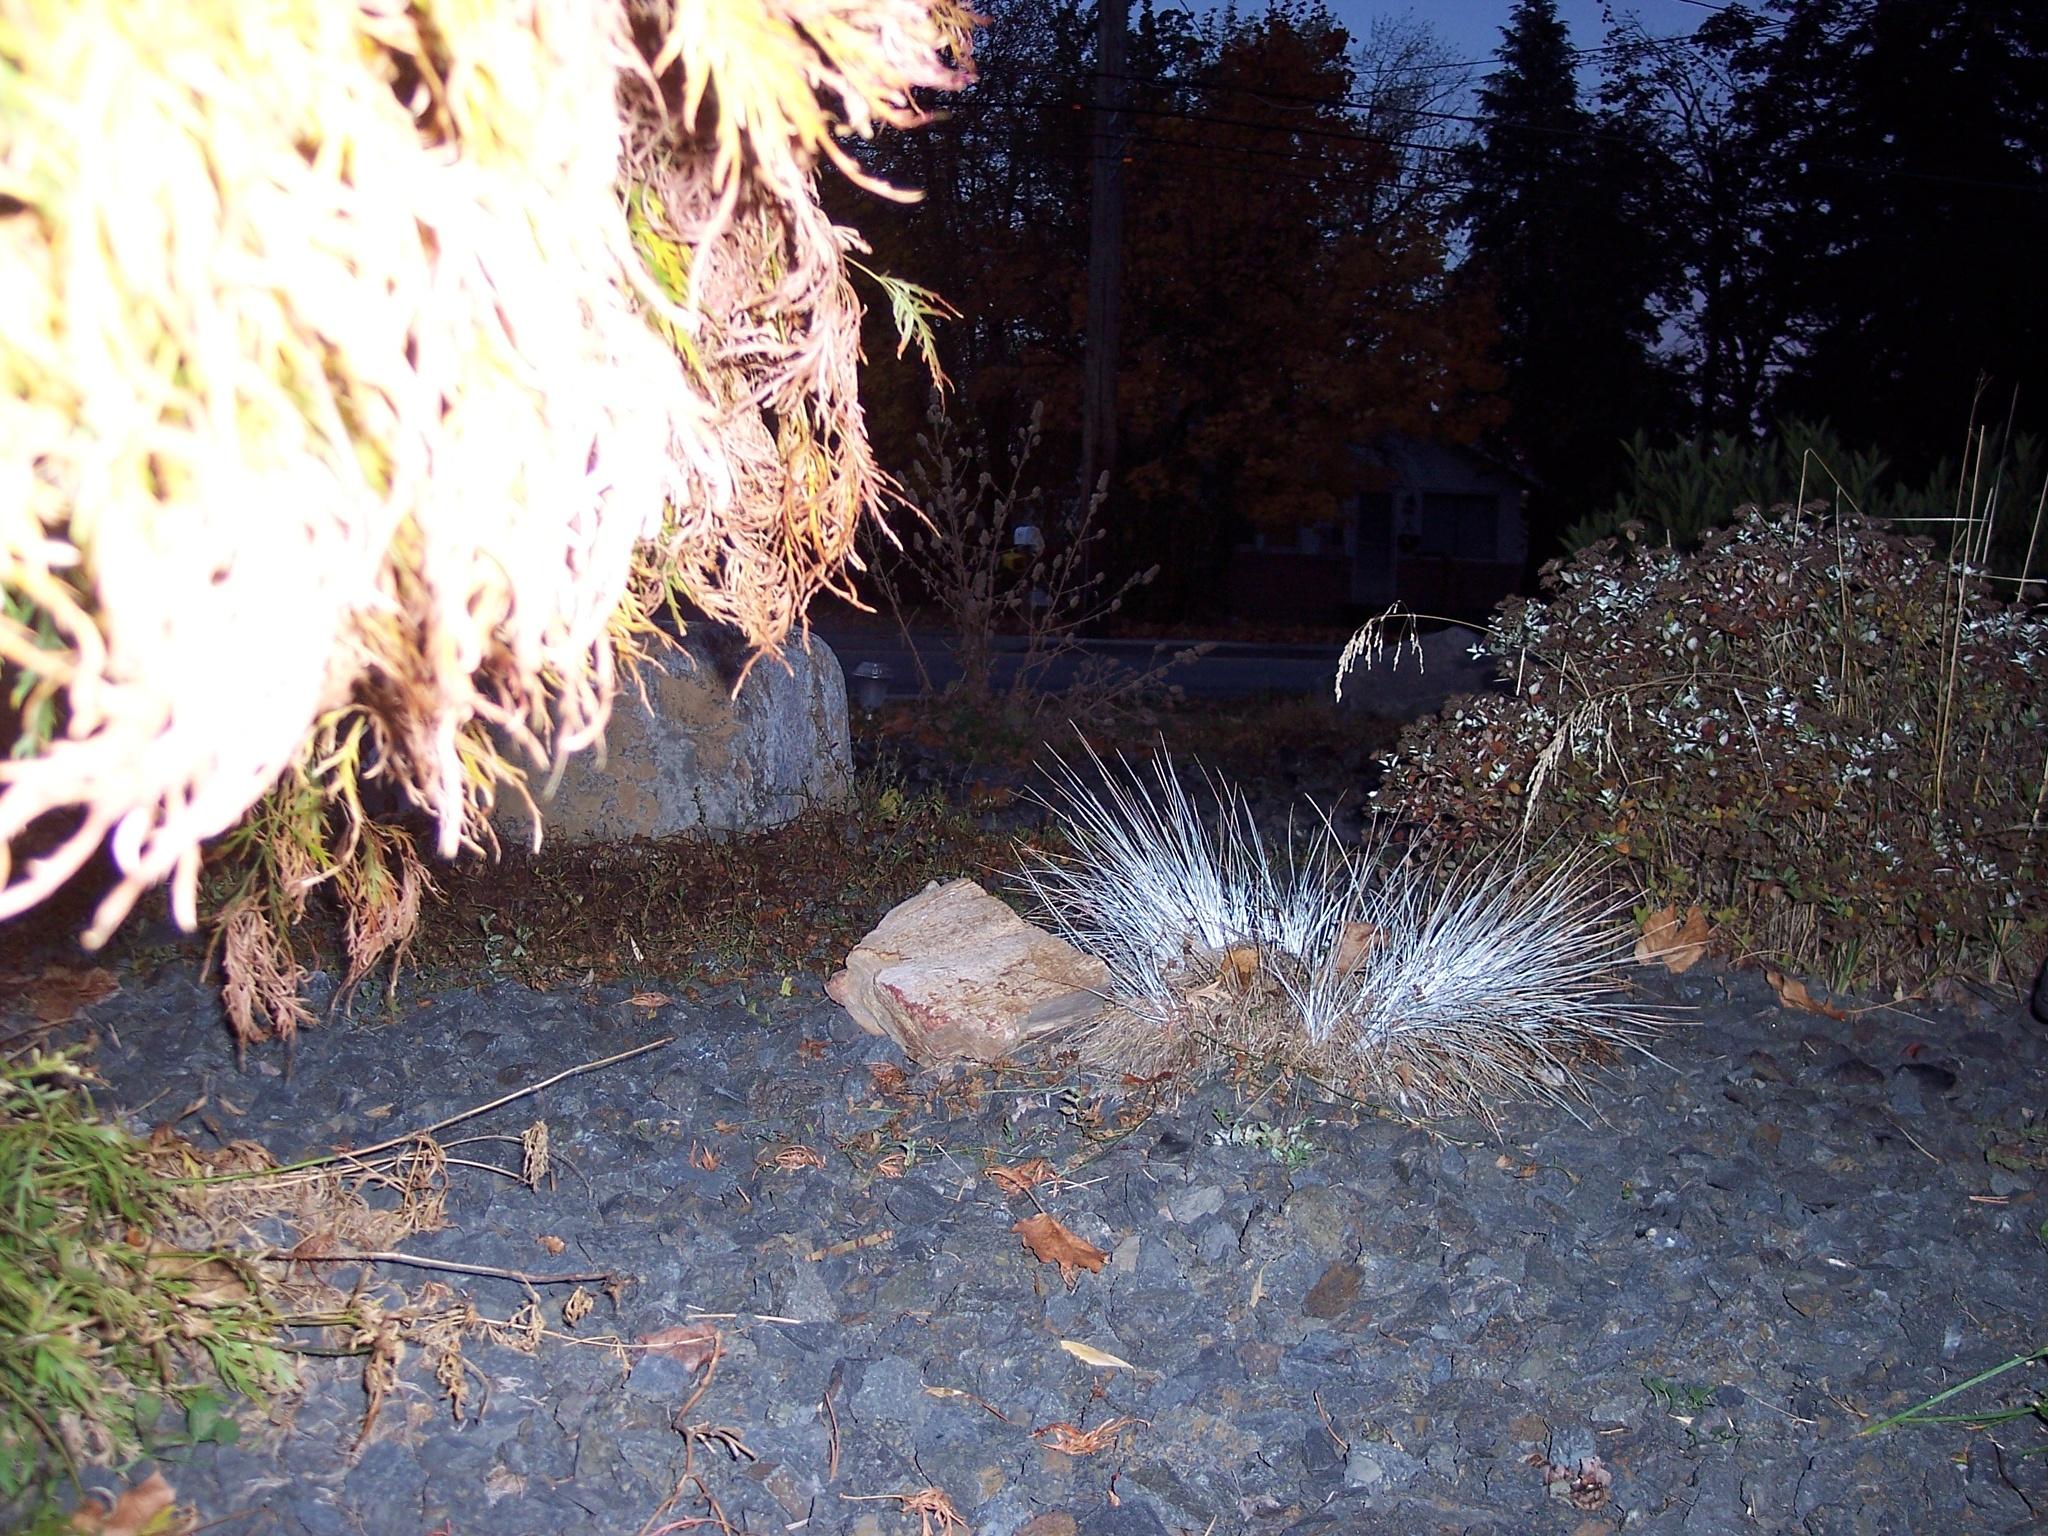 Evening In my yard by Dee